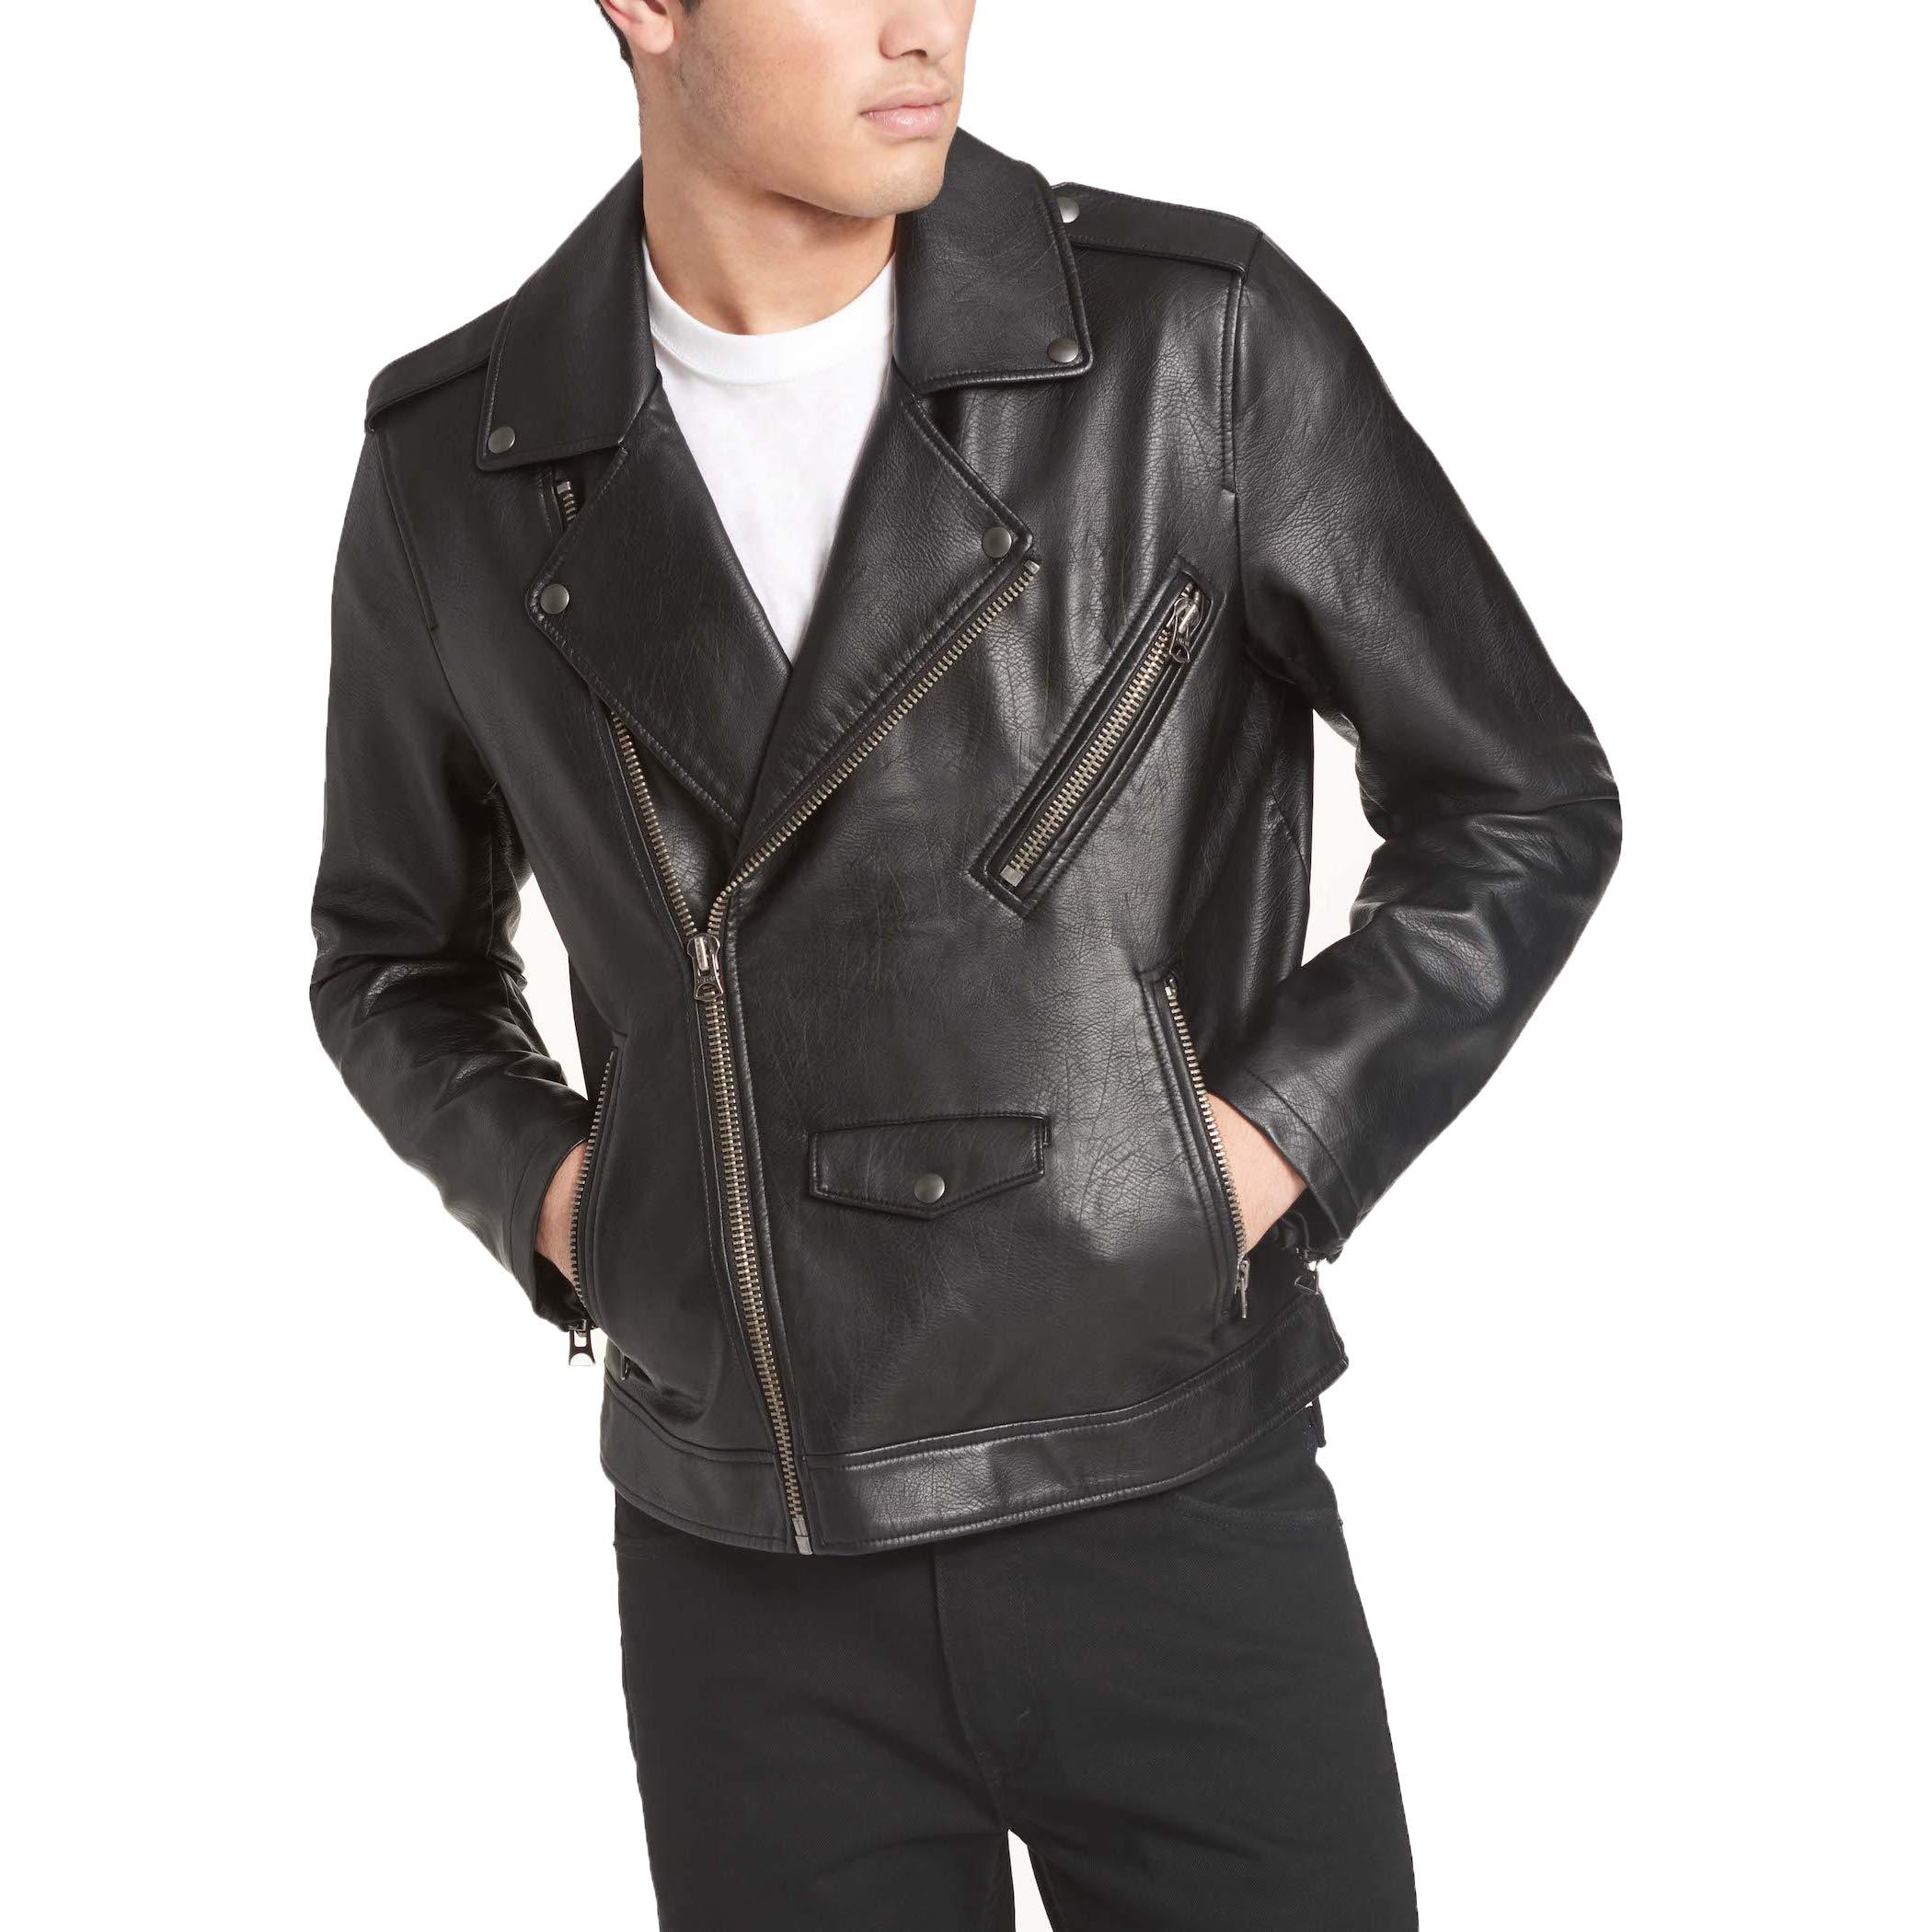 Levi's Men's Faux Leather Motorcycle Jacket